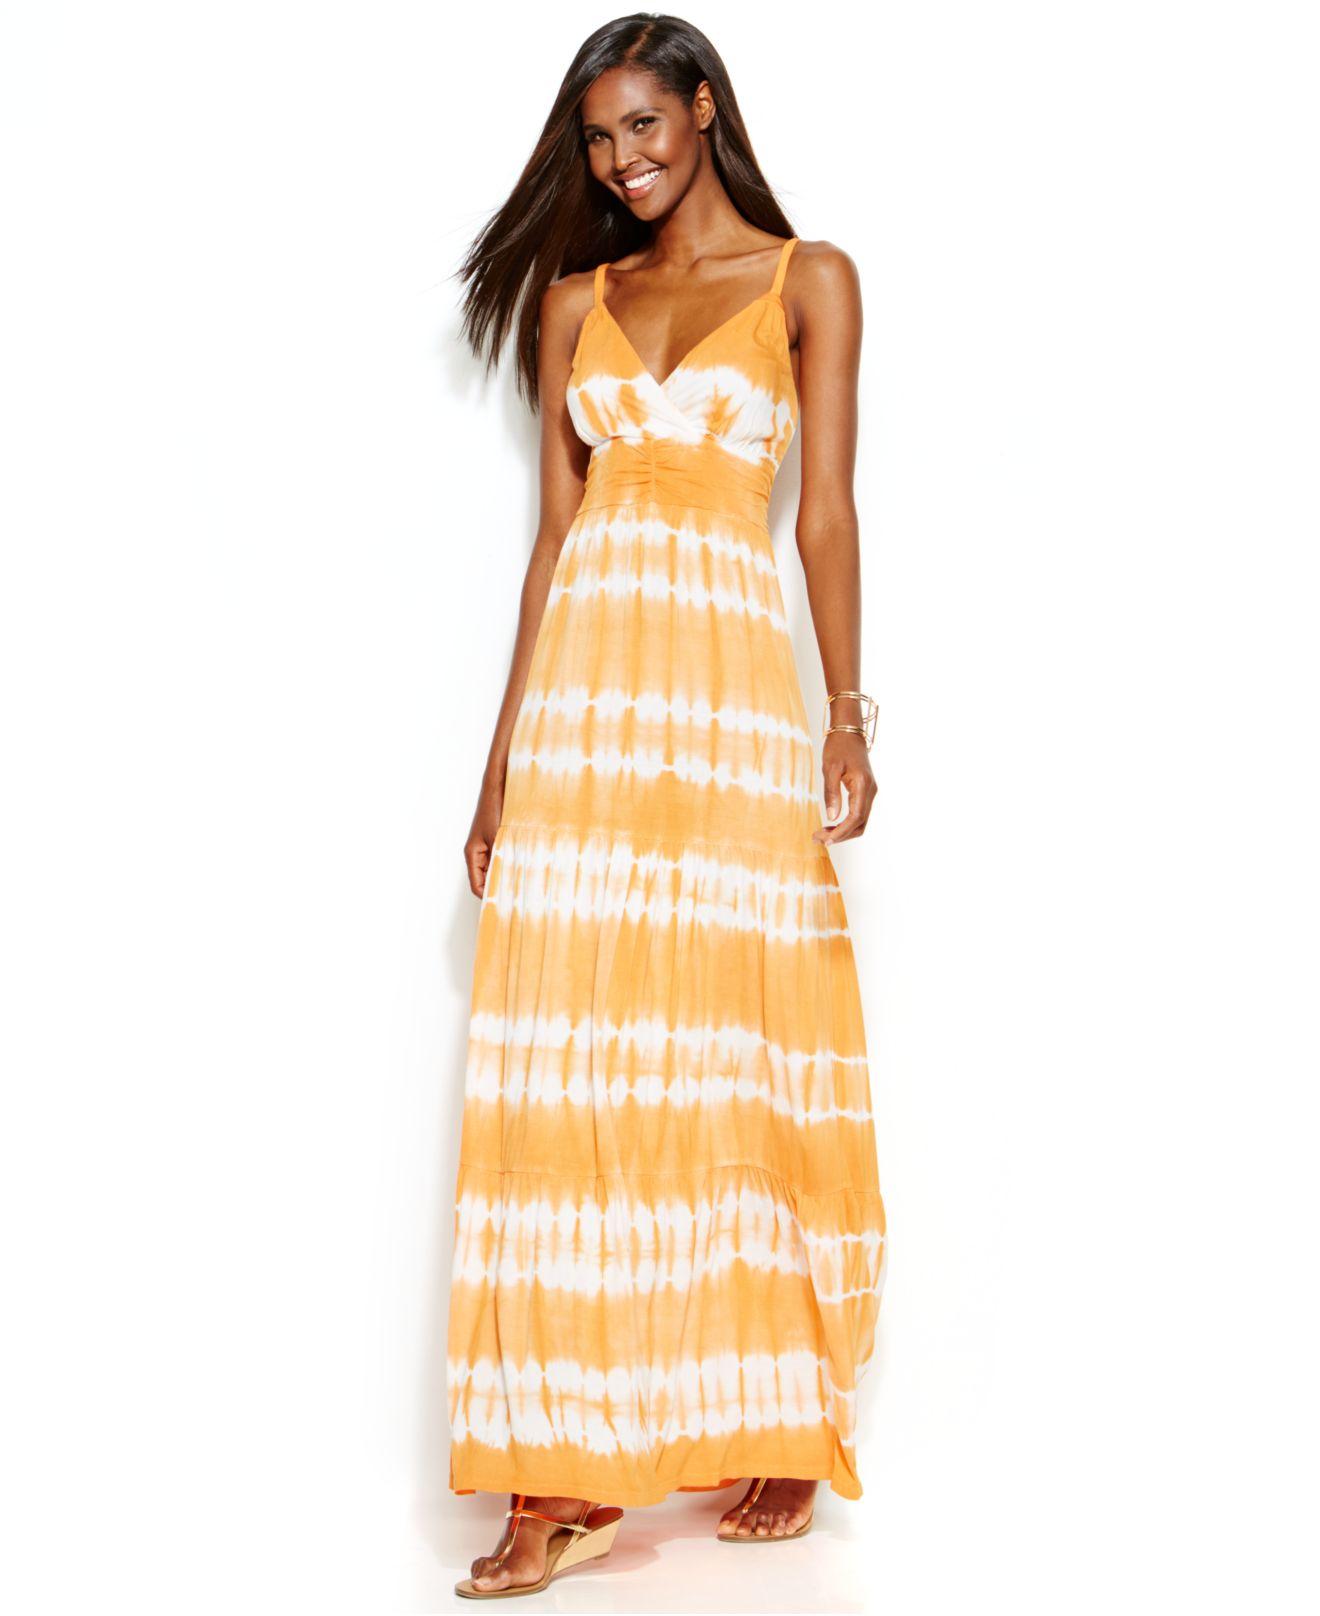 121545c0cc85 Lyst - INC International Concepts Tie-Dye Maxi Dress in Orange